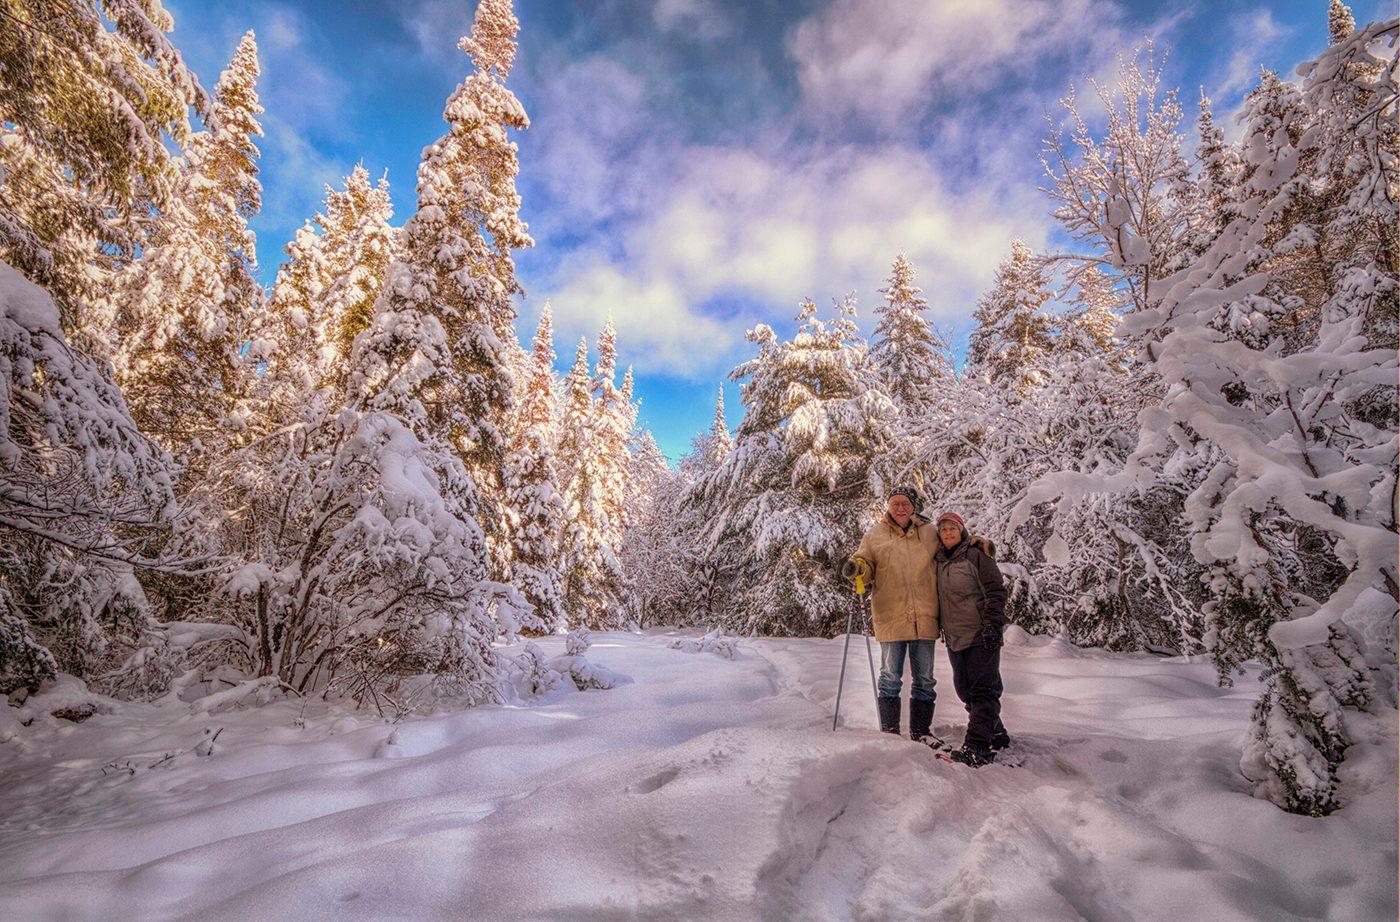 My Happy Place - Winter Wonderland 3